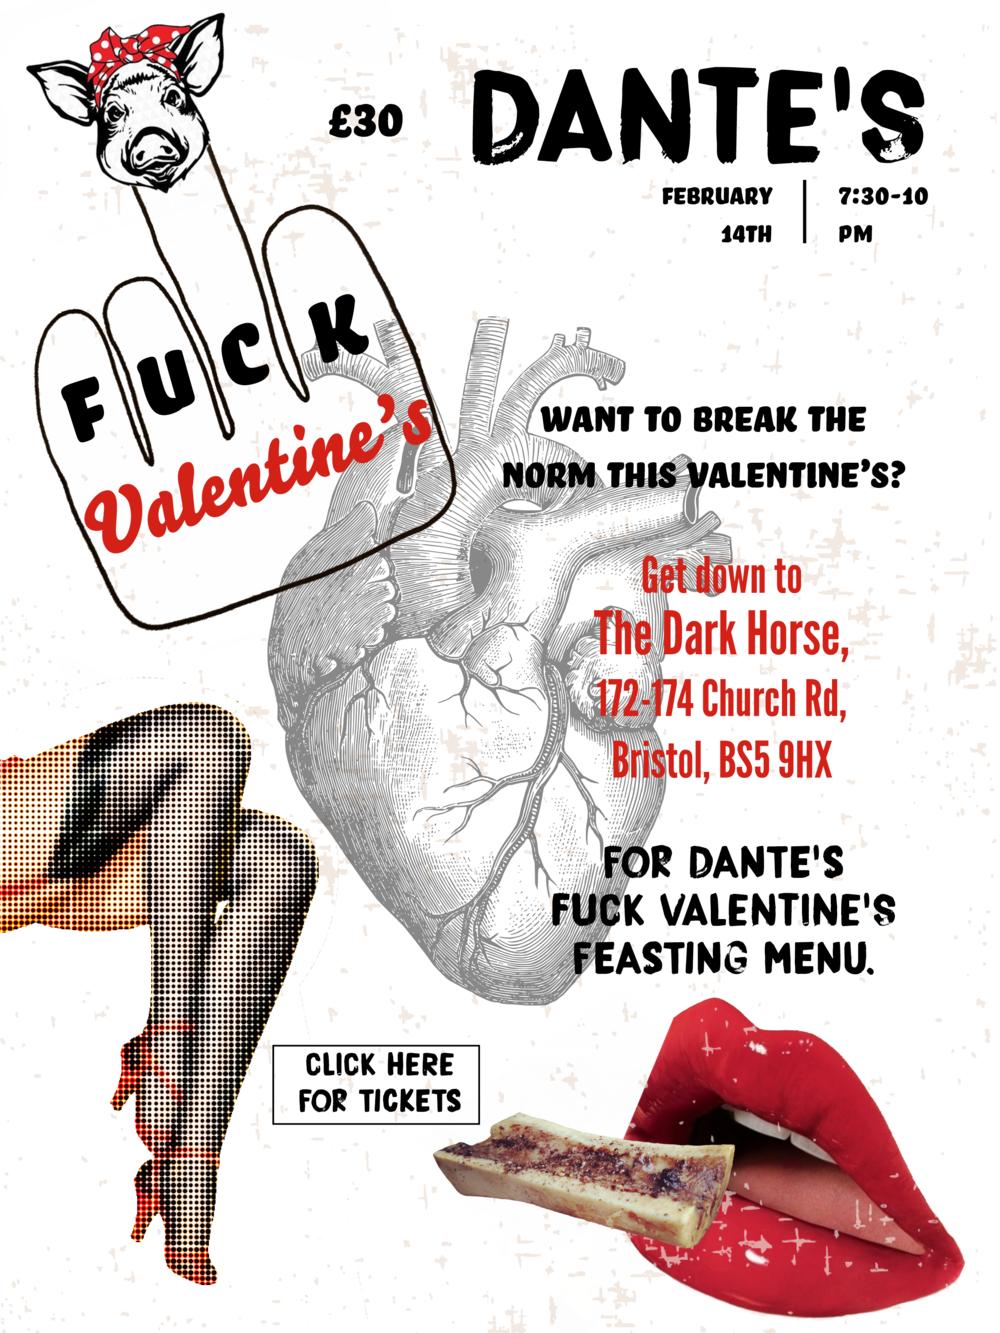 FUCK VALENTINE'S - £30 Feasting Menu @ The Dark Horse